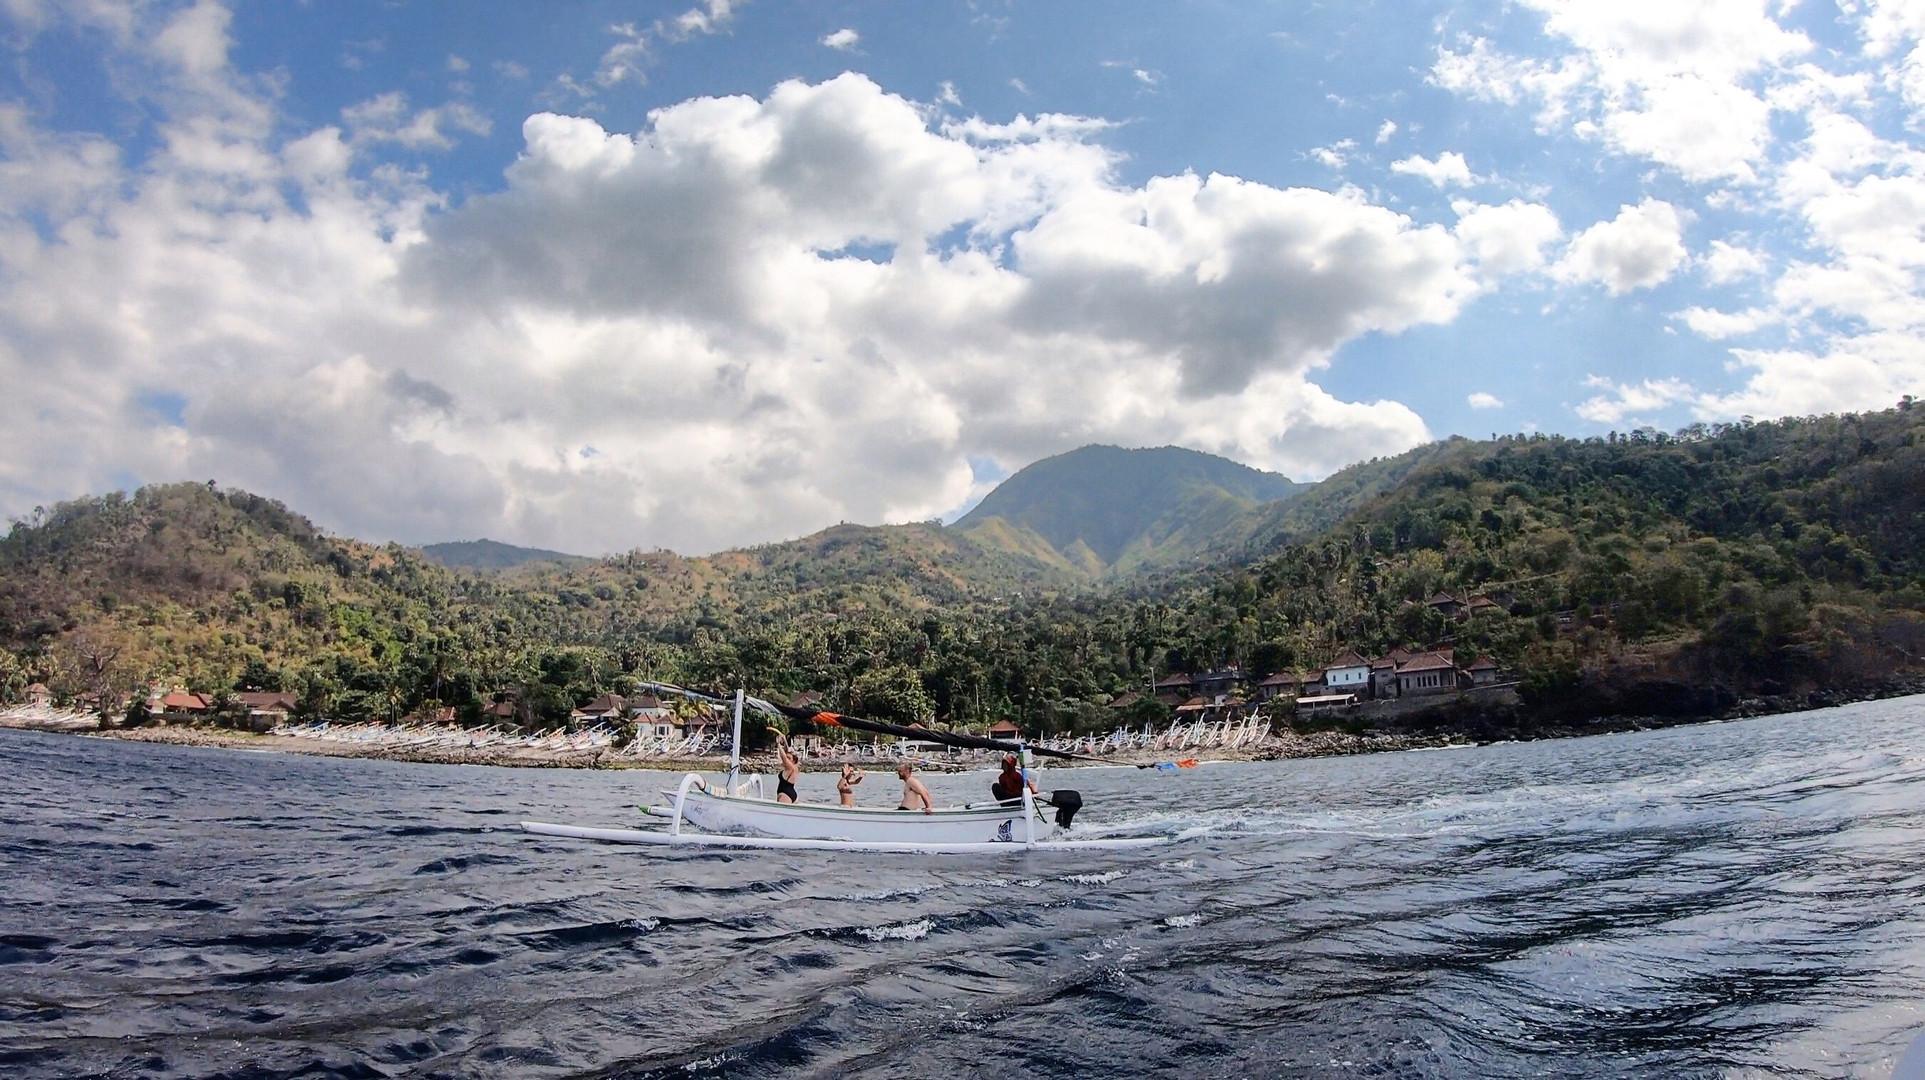 Diverse terrain & boat adventures Amed, Bali